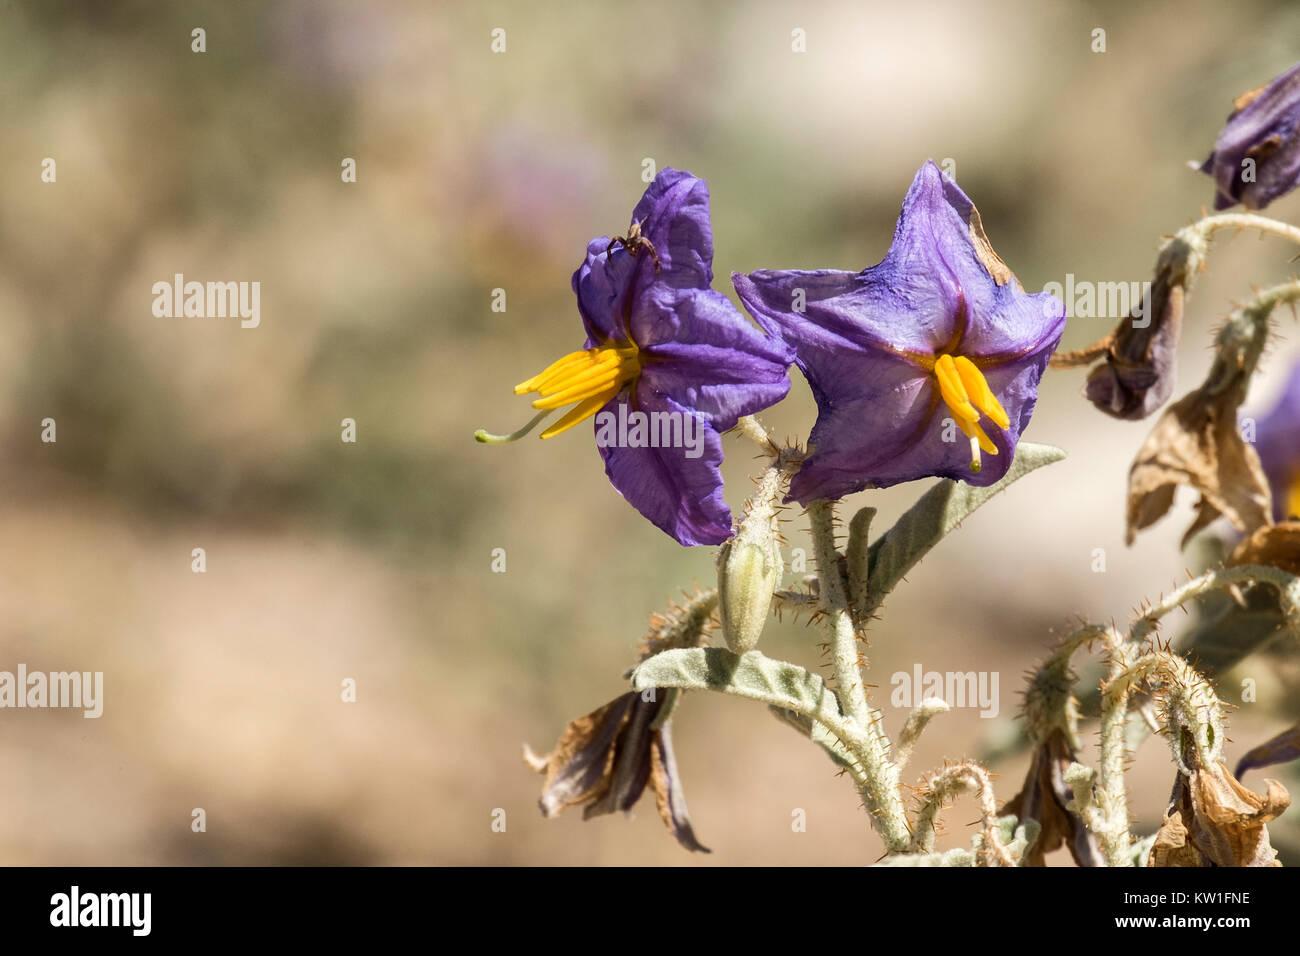 Purple flowers Solanum lycocarpum known as the wolf apple - Stock Image